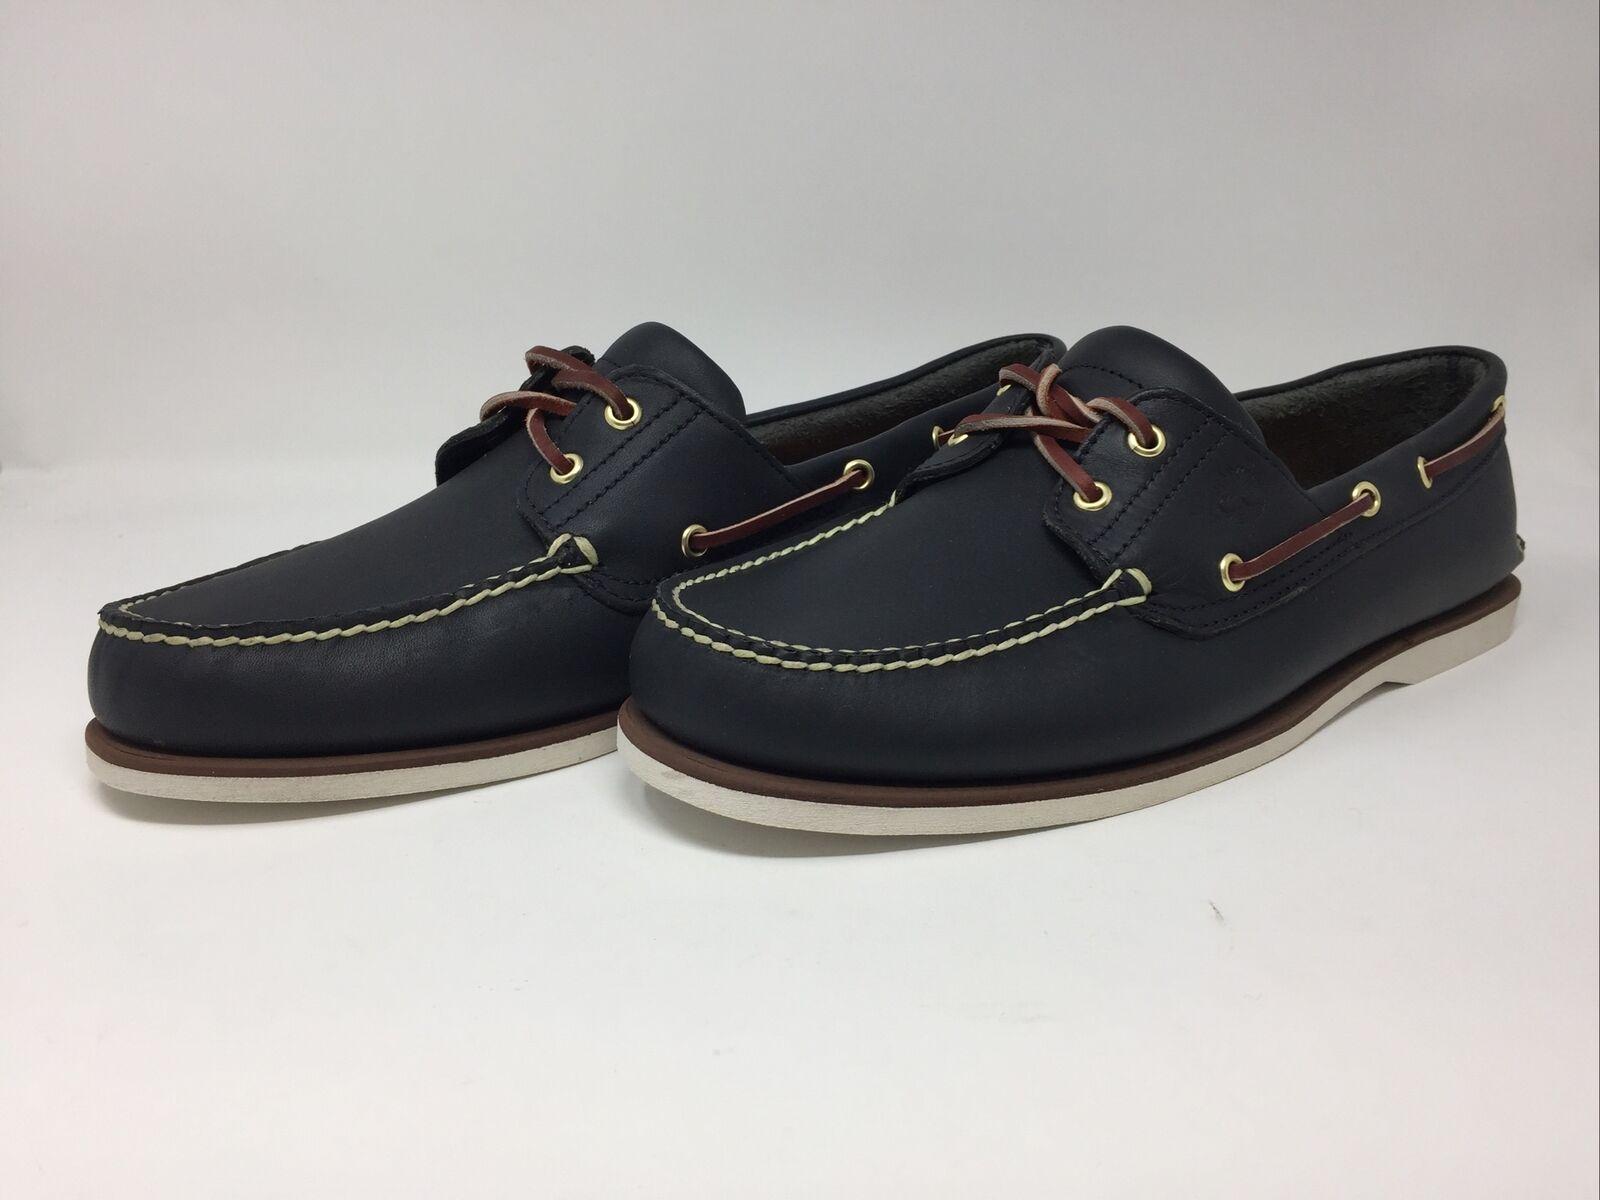 Contratación Pato Modernización  Timberland Classic Boat Shoes 2-Eye Boat Shoes Deck Shoes Men Shoes Shoes  for sale online | eBay